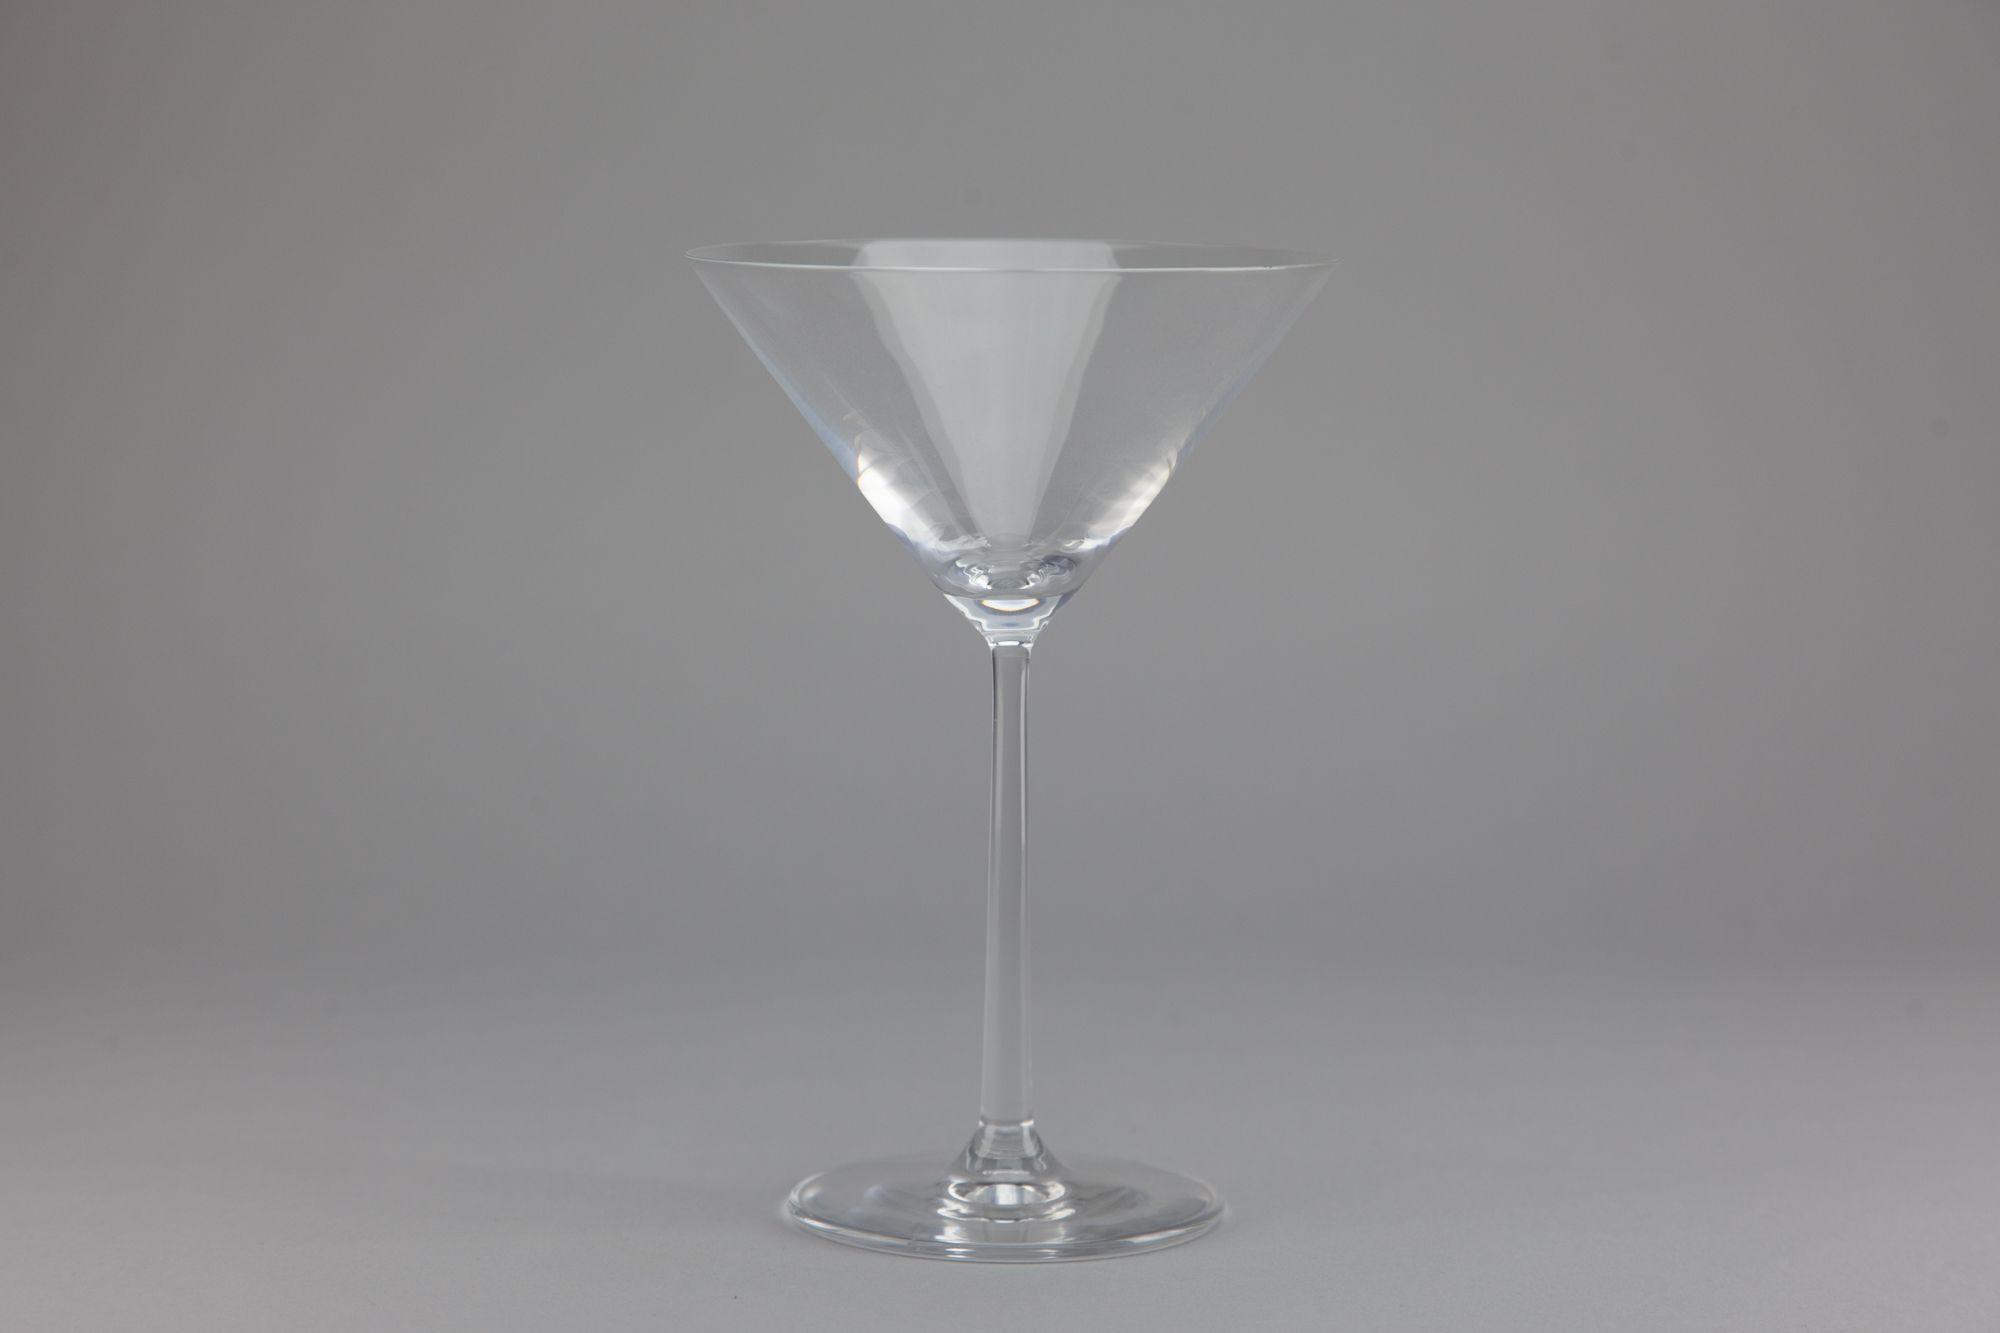 Copo Martini de Cristal   A Loja do Gato Preto   #alojadogatopreto   #shoponline